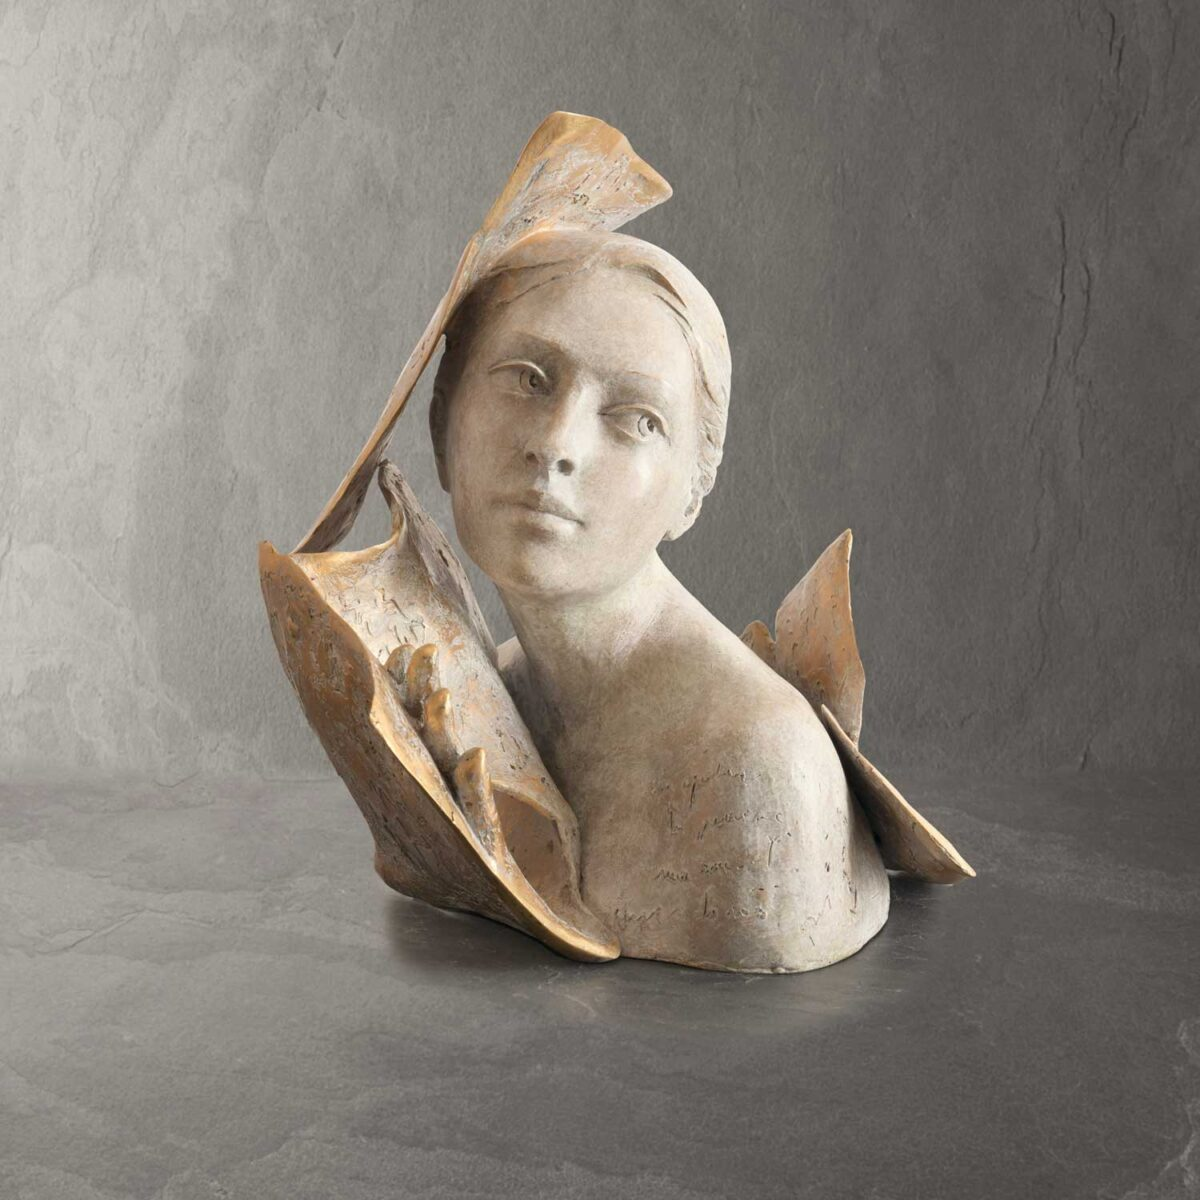 Ailleurs - Paola Grizi - sculpture bronze - © Casart